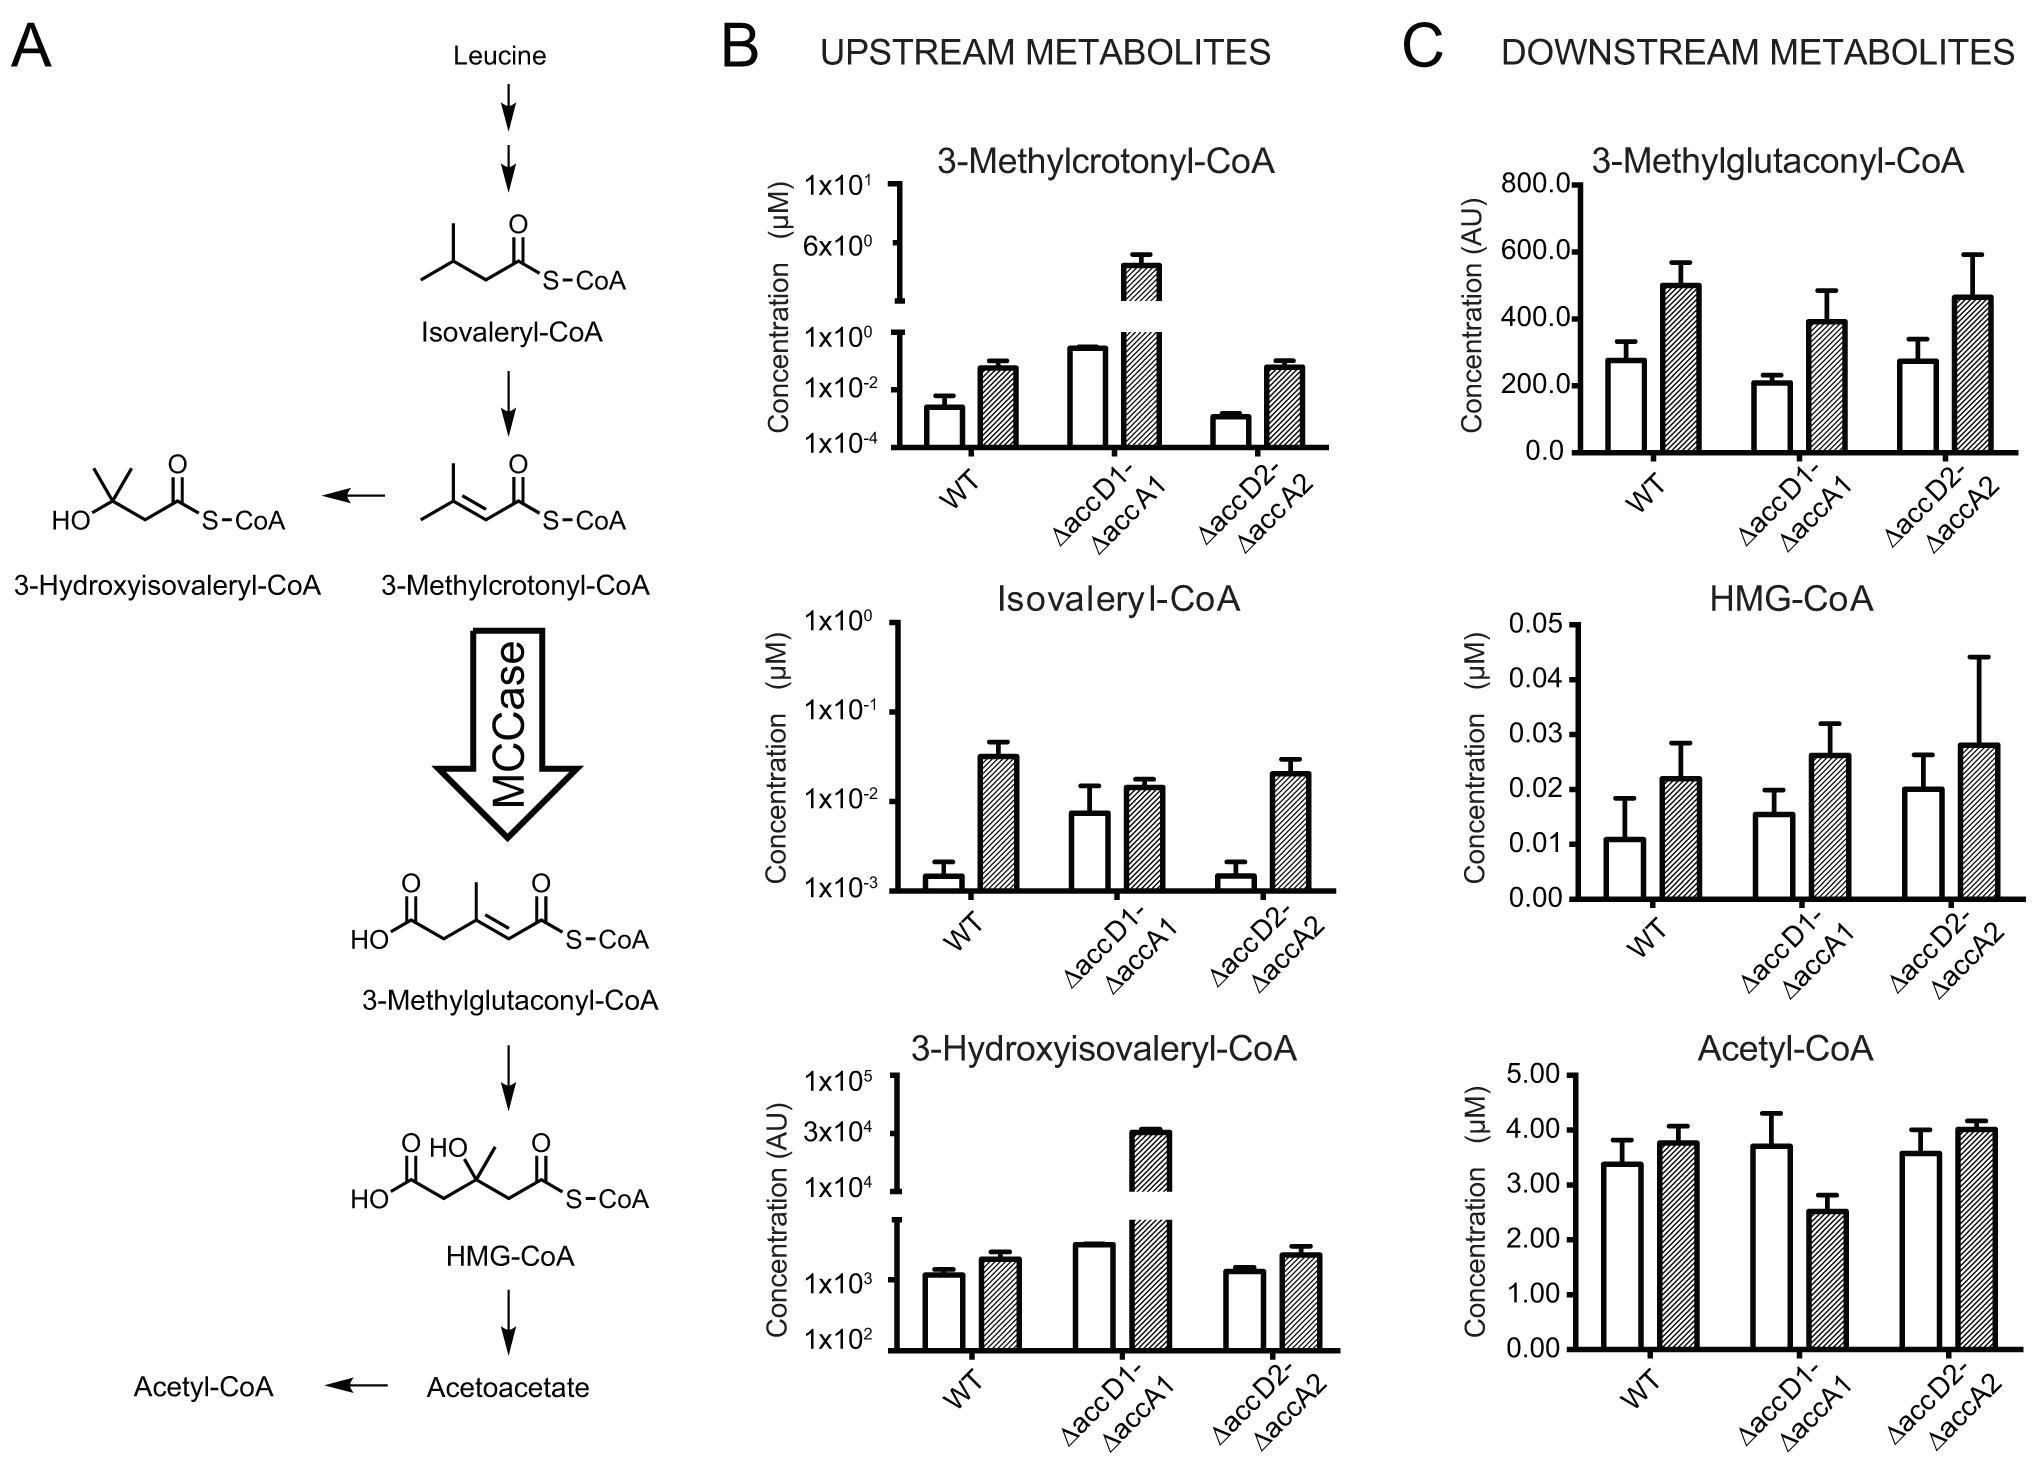 Metabolite analysis upstream and downstream of 3-methylcrotonyl-CoA.